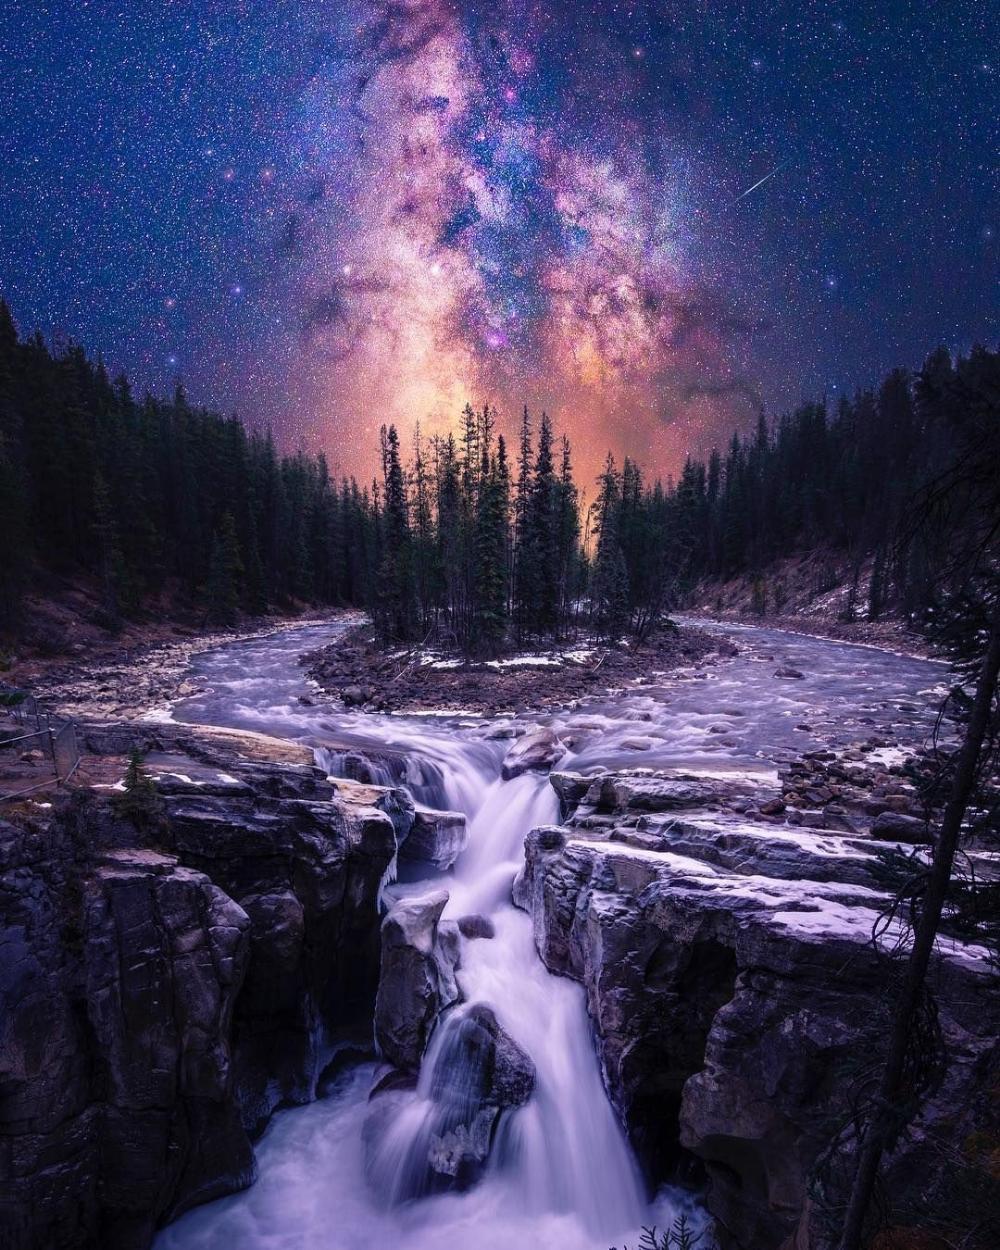 Julio Maiz On Breathtaking Photography Nature Tourism Beautiful Landscapes